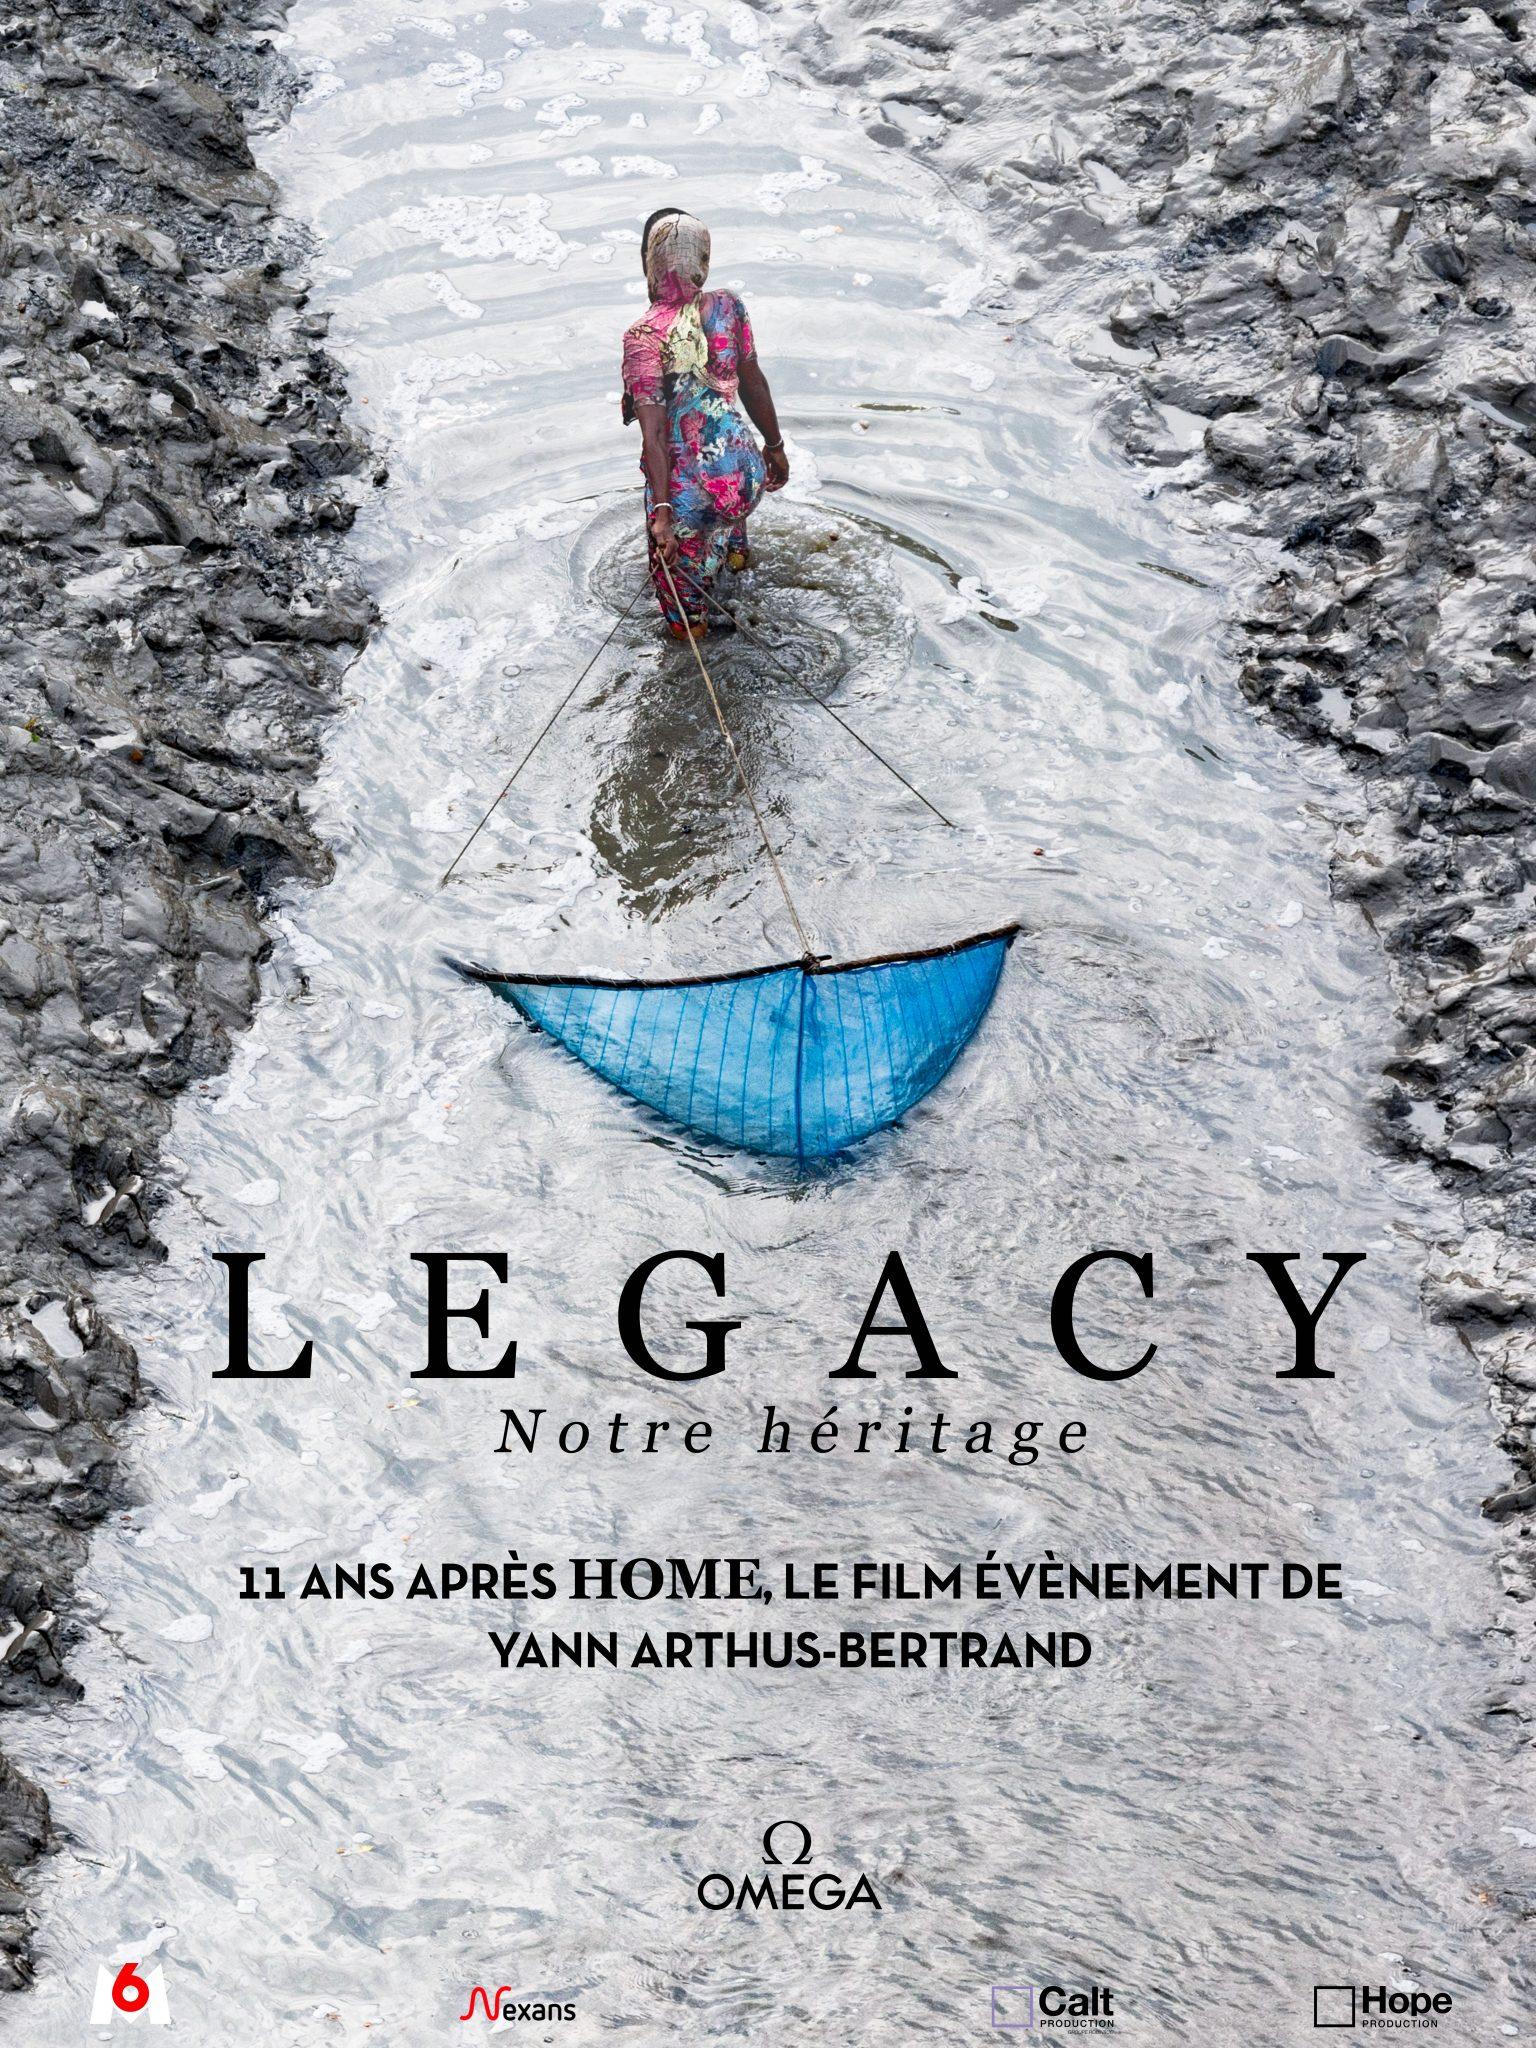 legacy yann arthus-bertrand barbara pompili